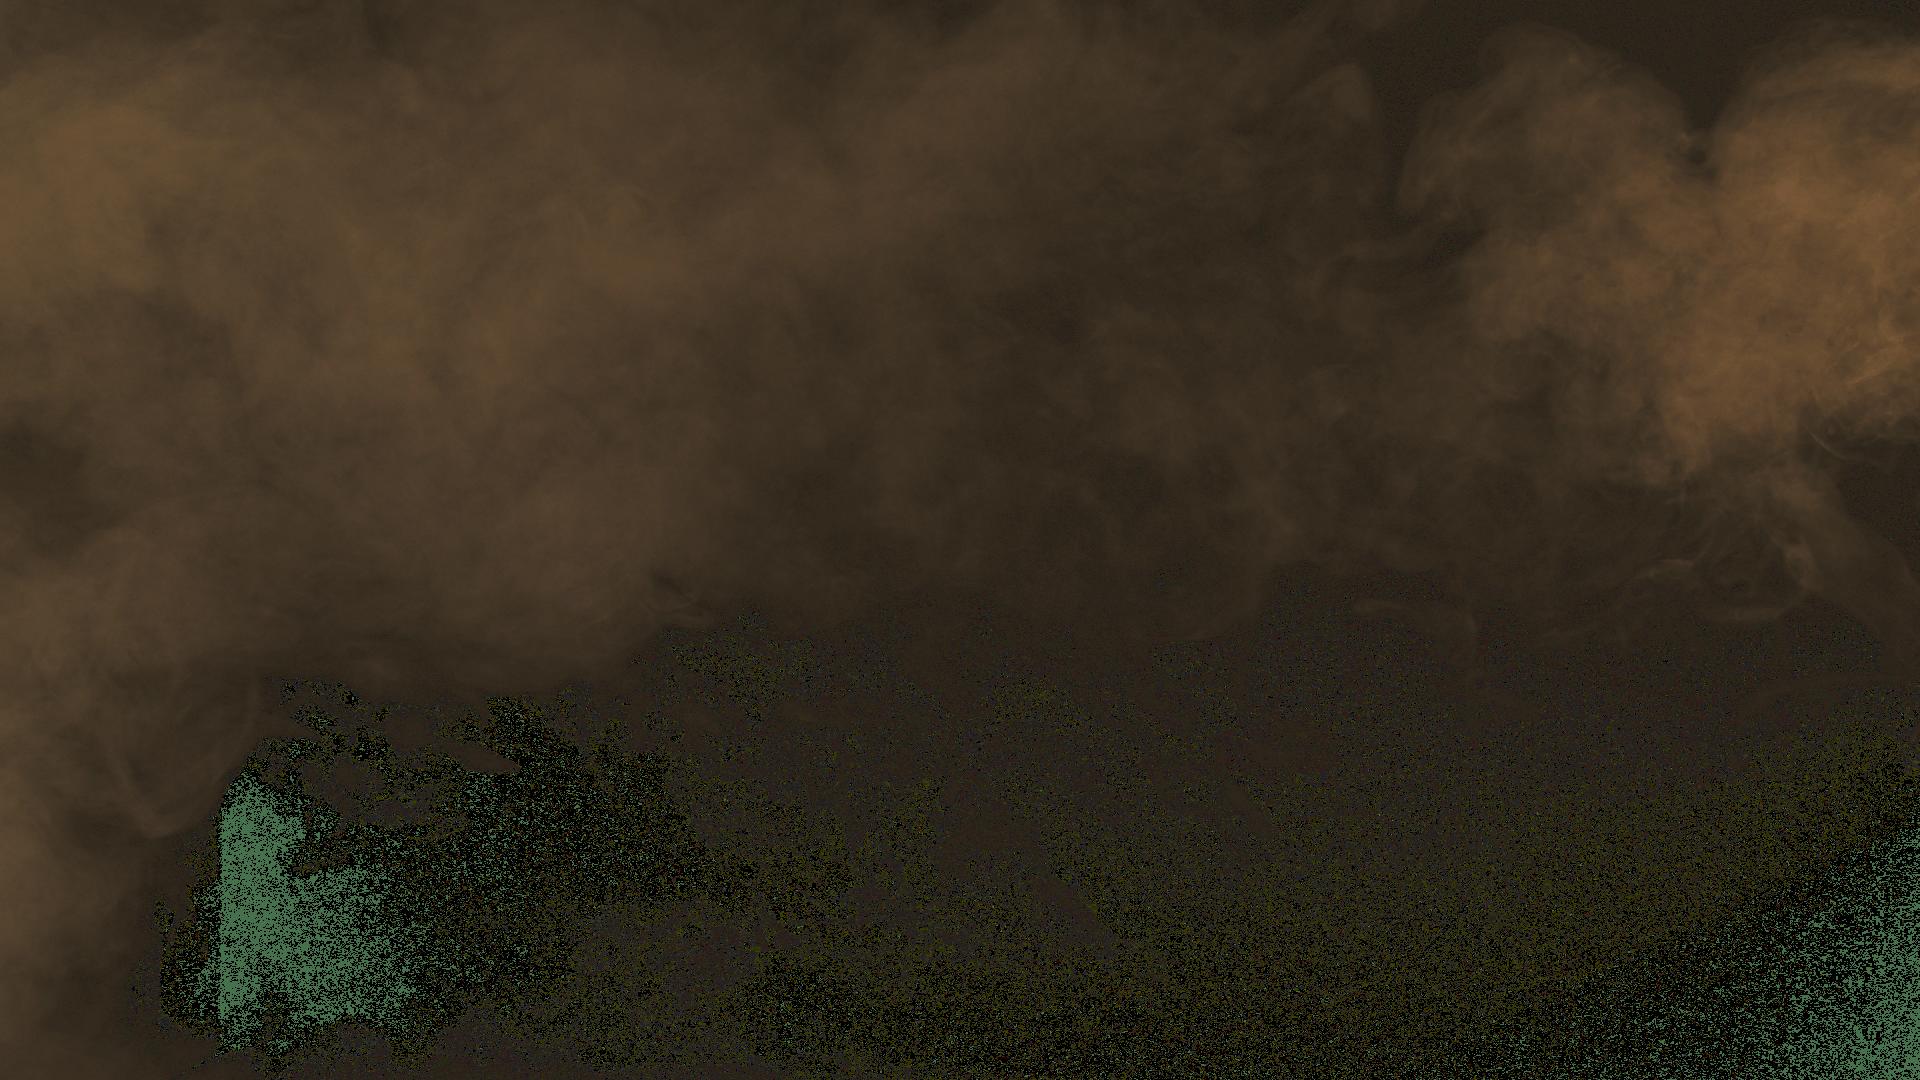 Dirty transparent png stickpng. Fog clipart sky